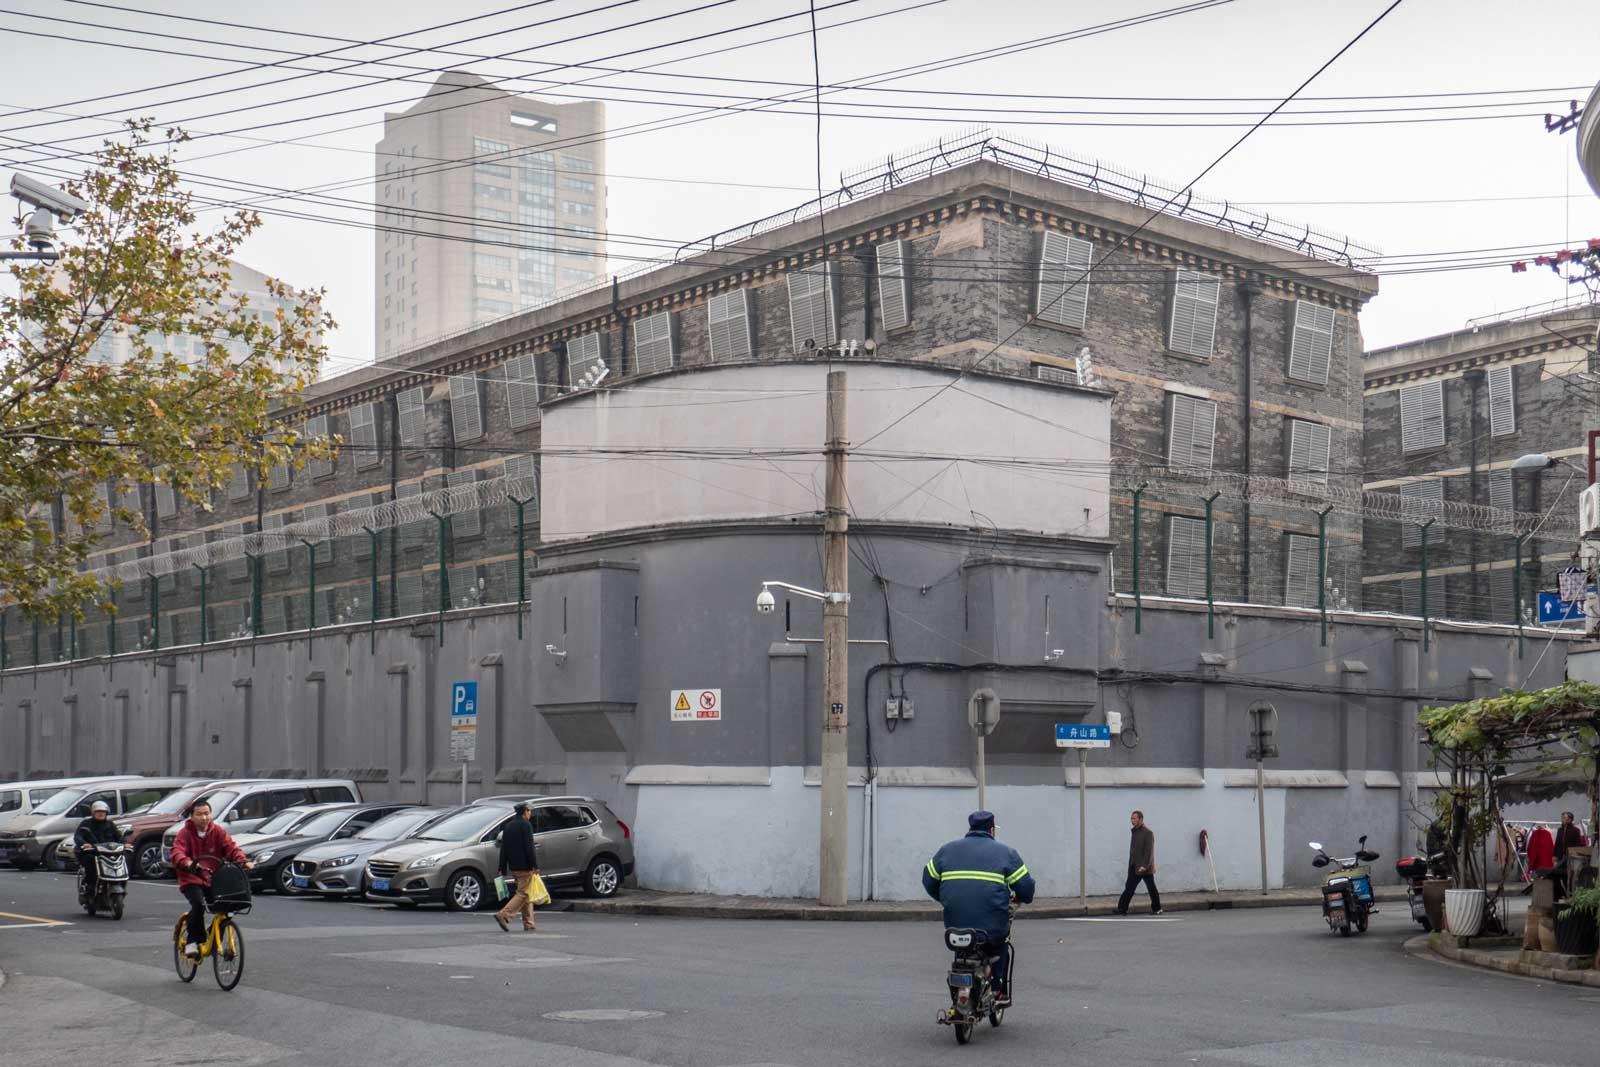 Tilanqiao Prison Shanghai